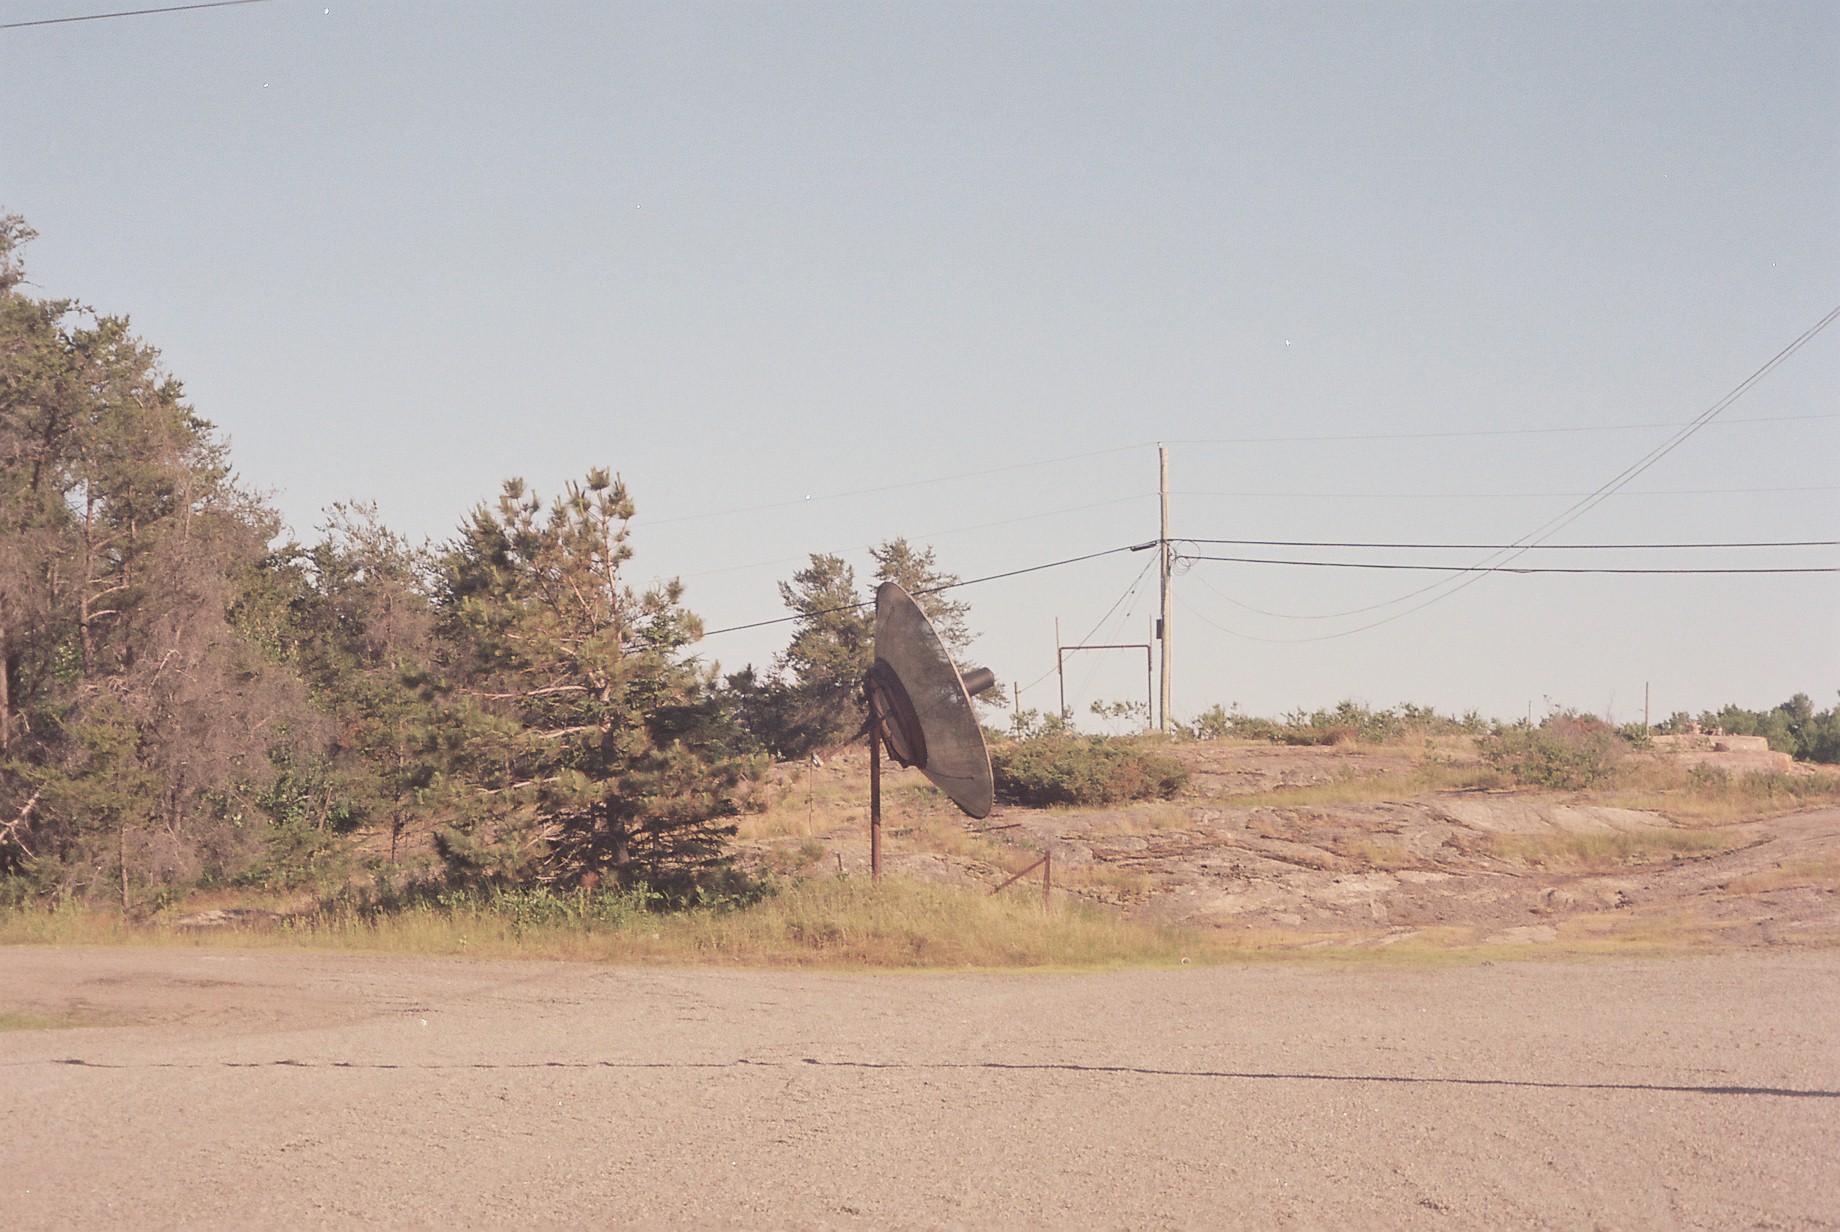 untitled shoot-3710022.JPG